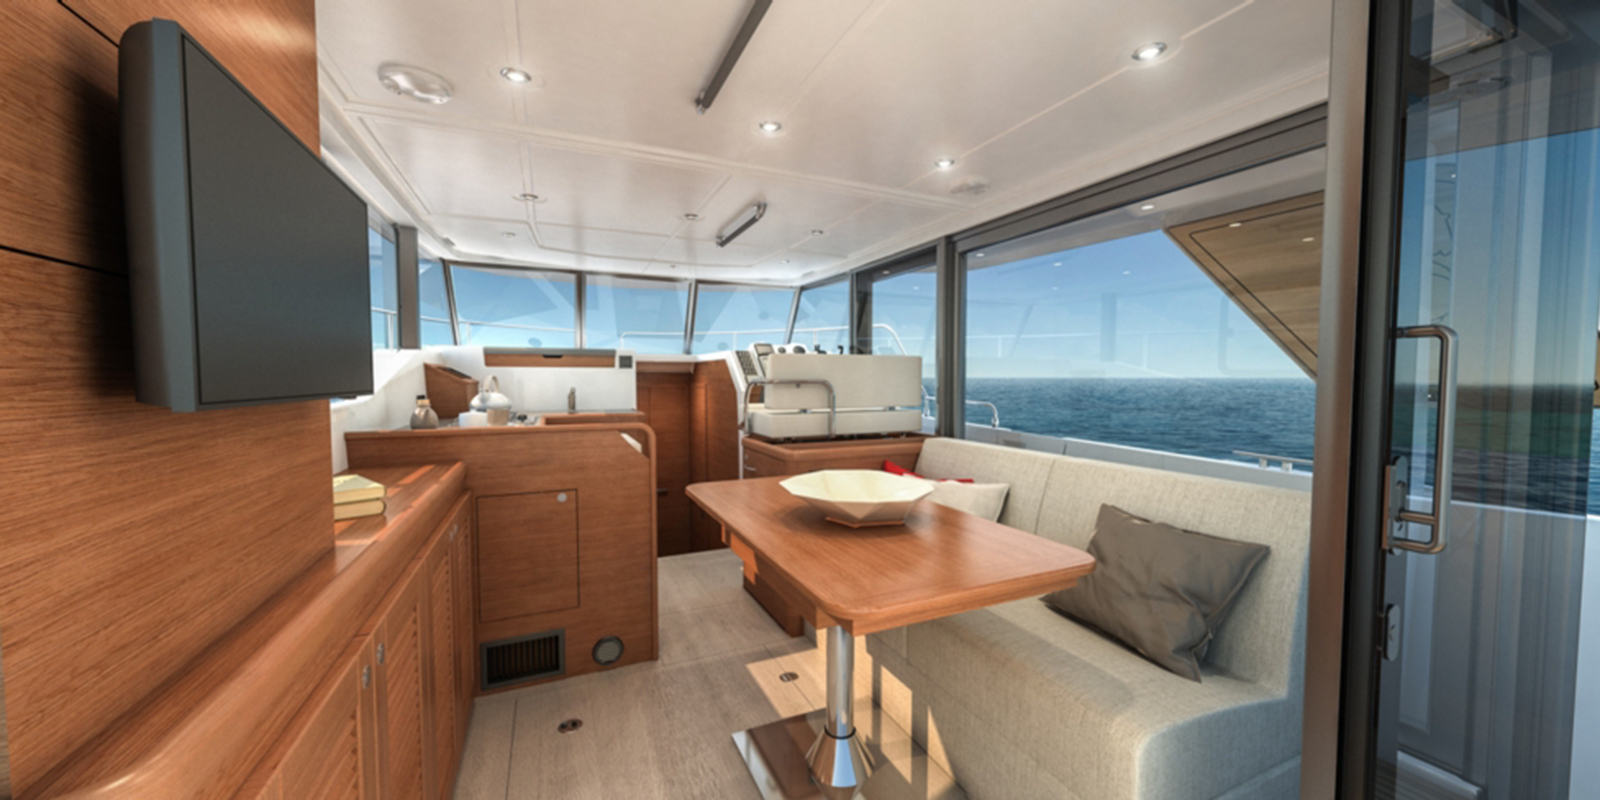 Beneteau Swift Trawler 35 — Salon Forward